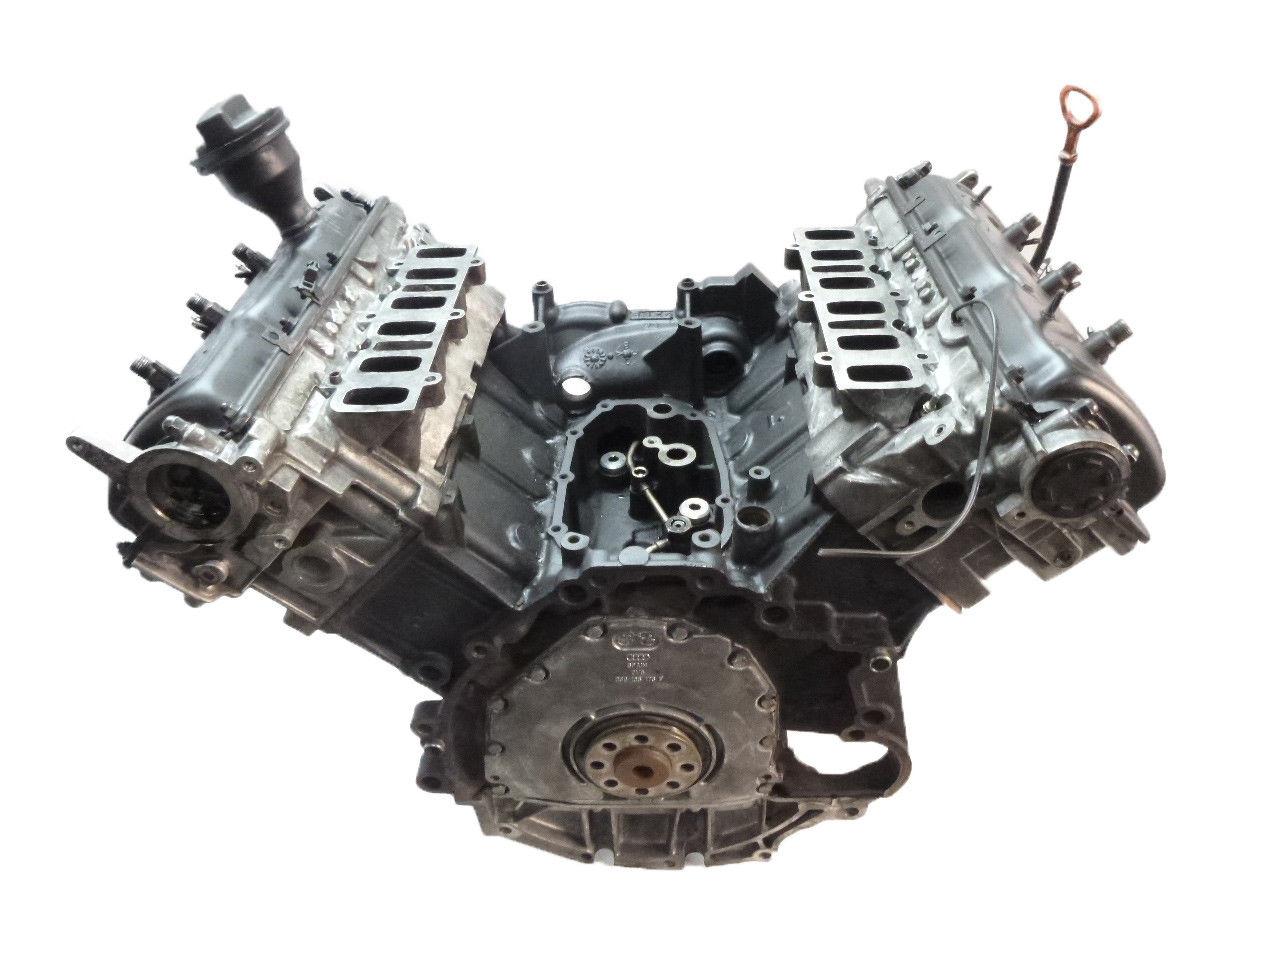 Motor Überholung Instandsetzung Reparatur Audi Skoda VW A4 A6 2,5 TDI V6 AFB